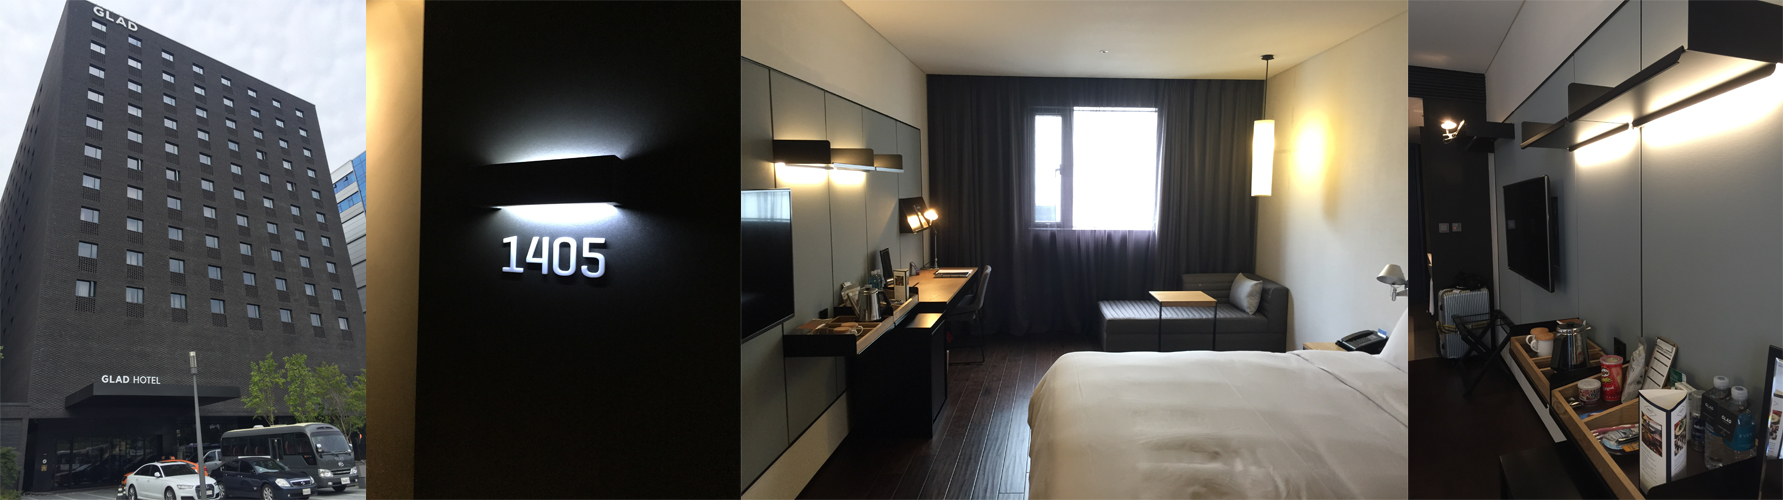 GLAD hotel Seoul